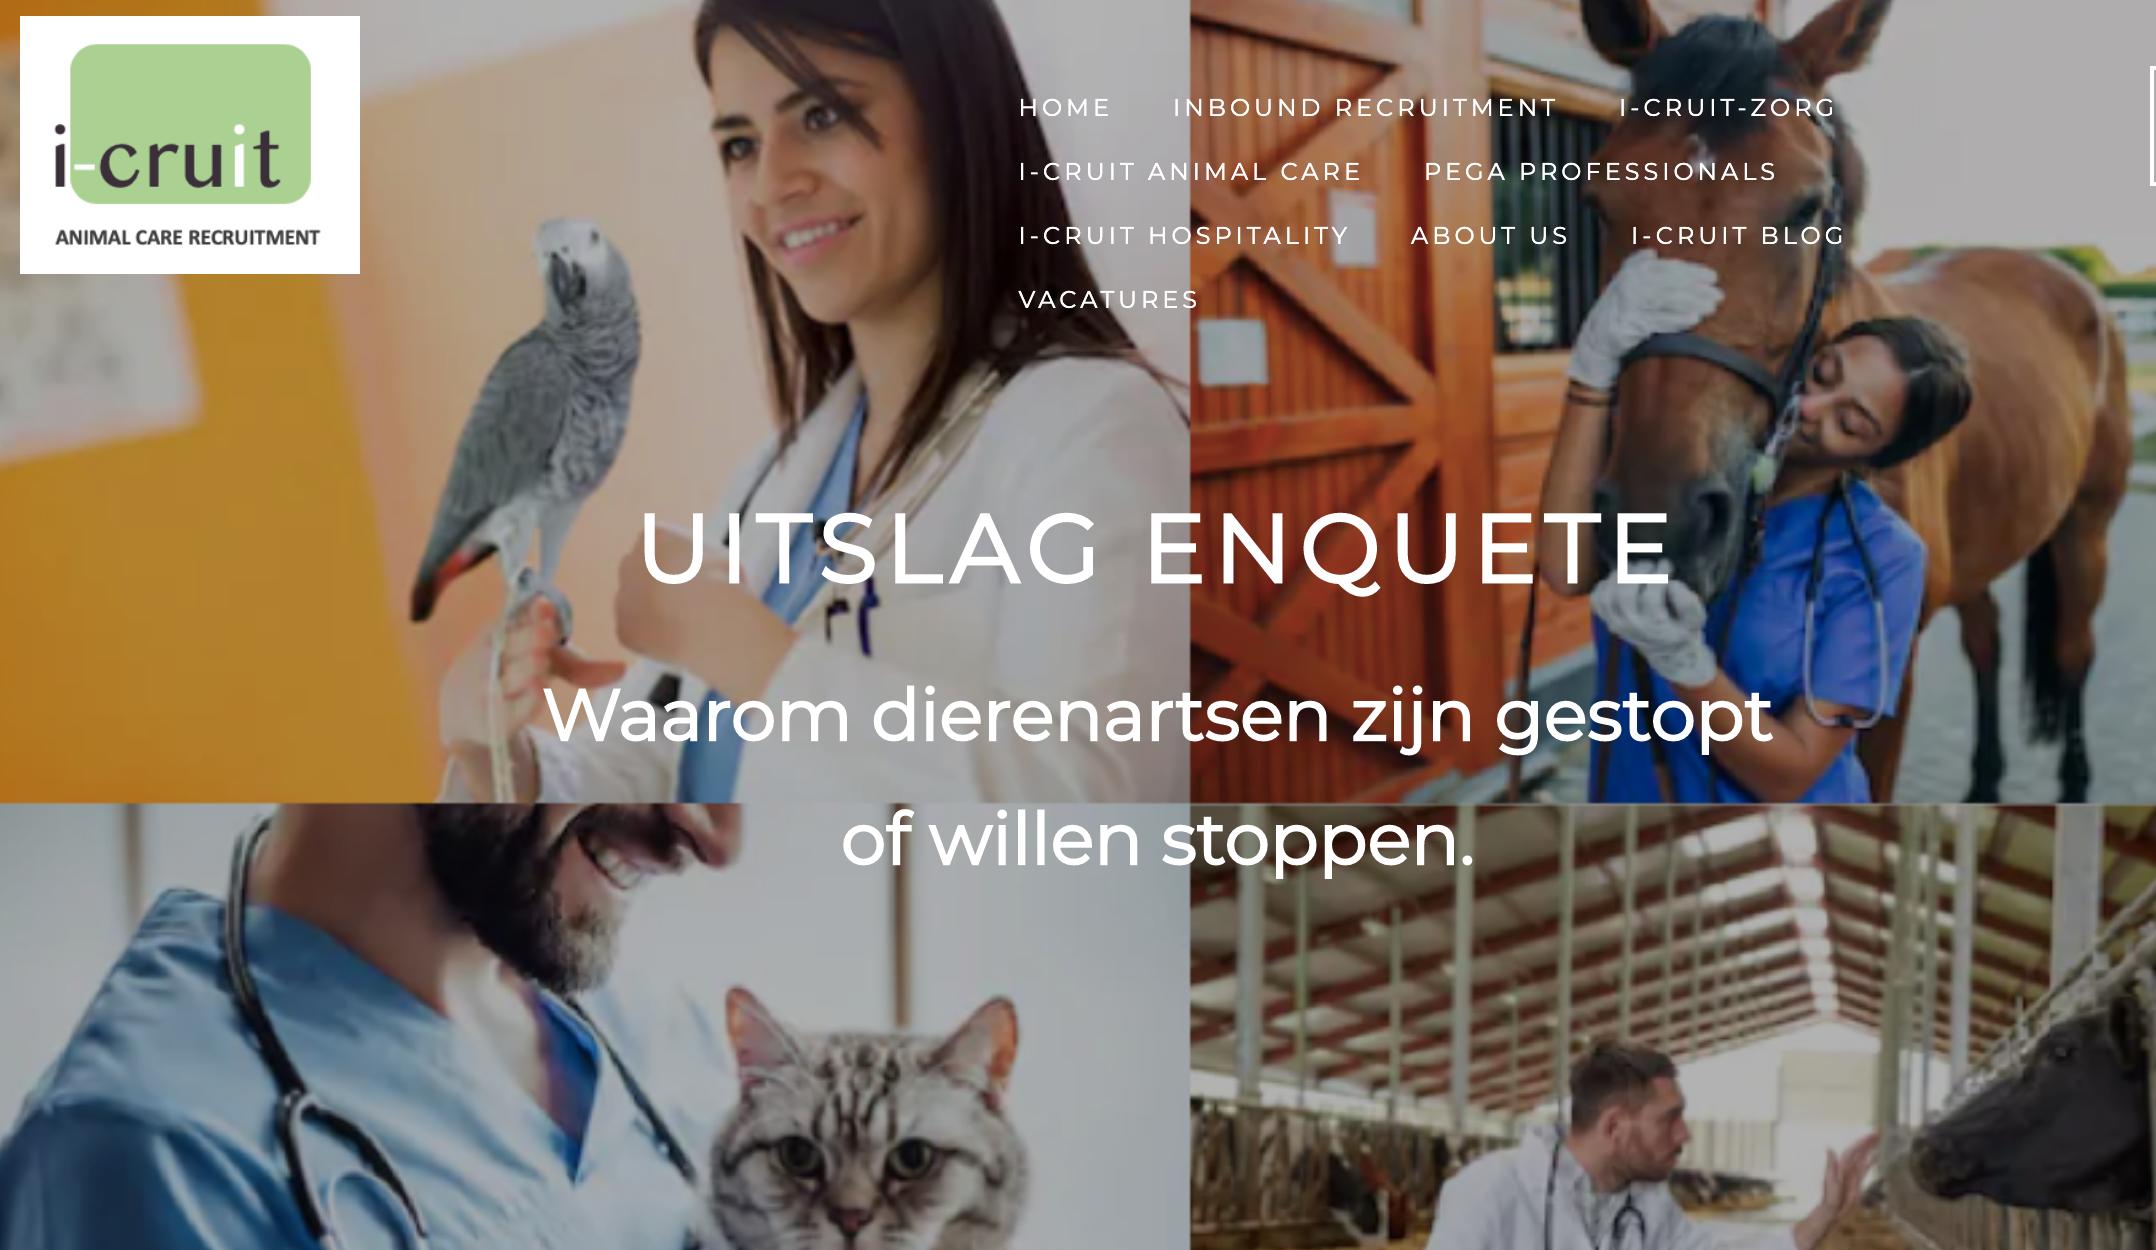 uitslag i-Cruit Animal Care dierenartsen enquete